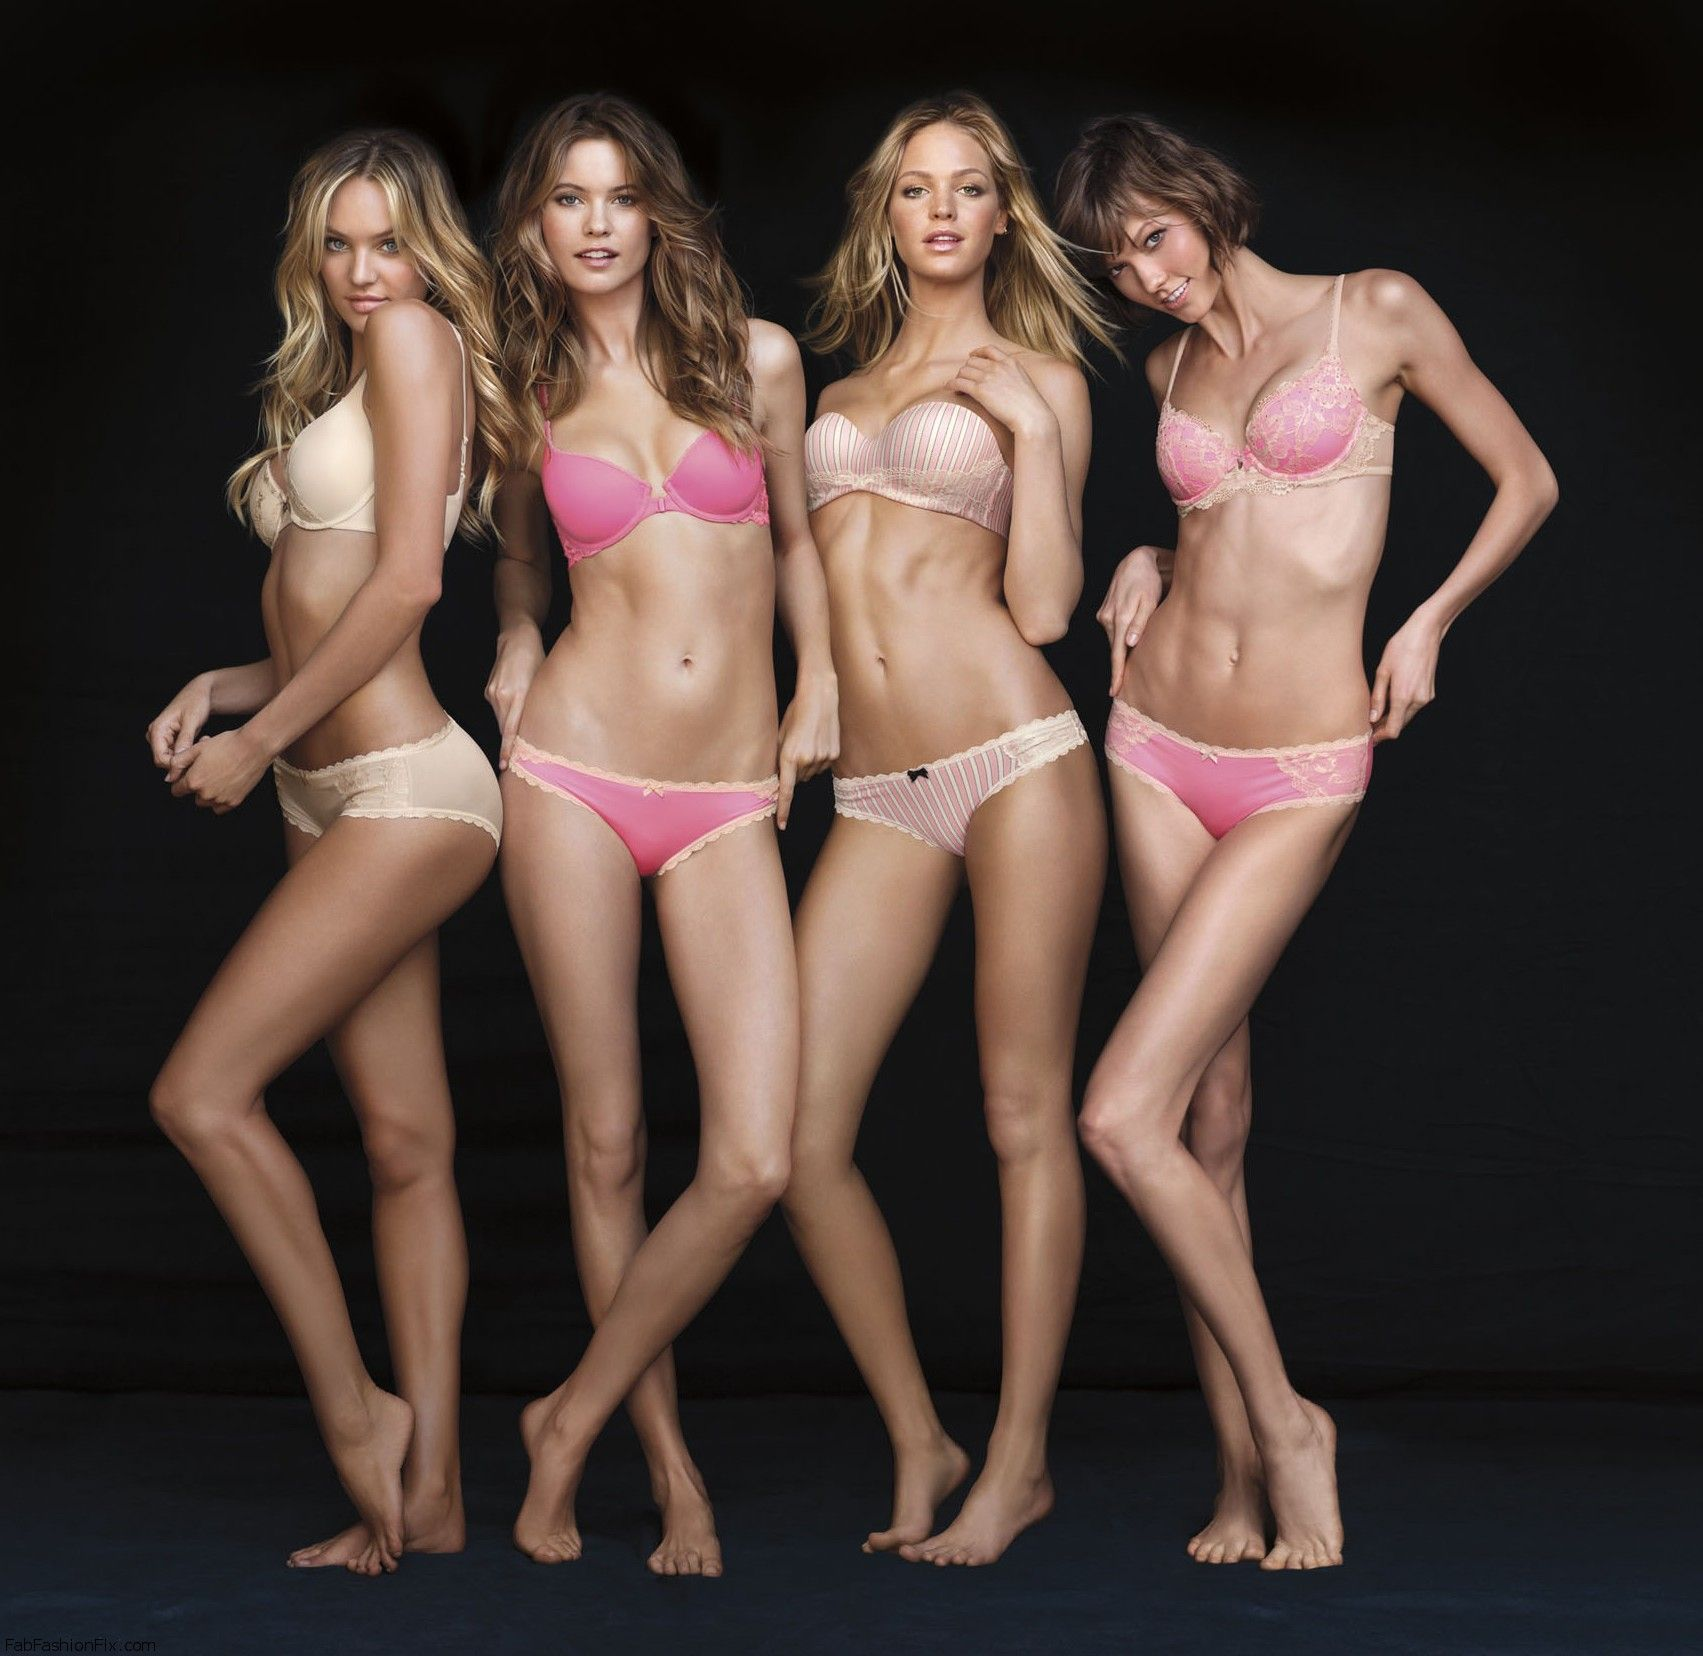 body-by-victoria-2013-demi-push-up-multi-bra-4-styles-victorias-secret-hi-res